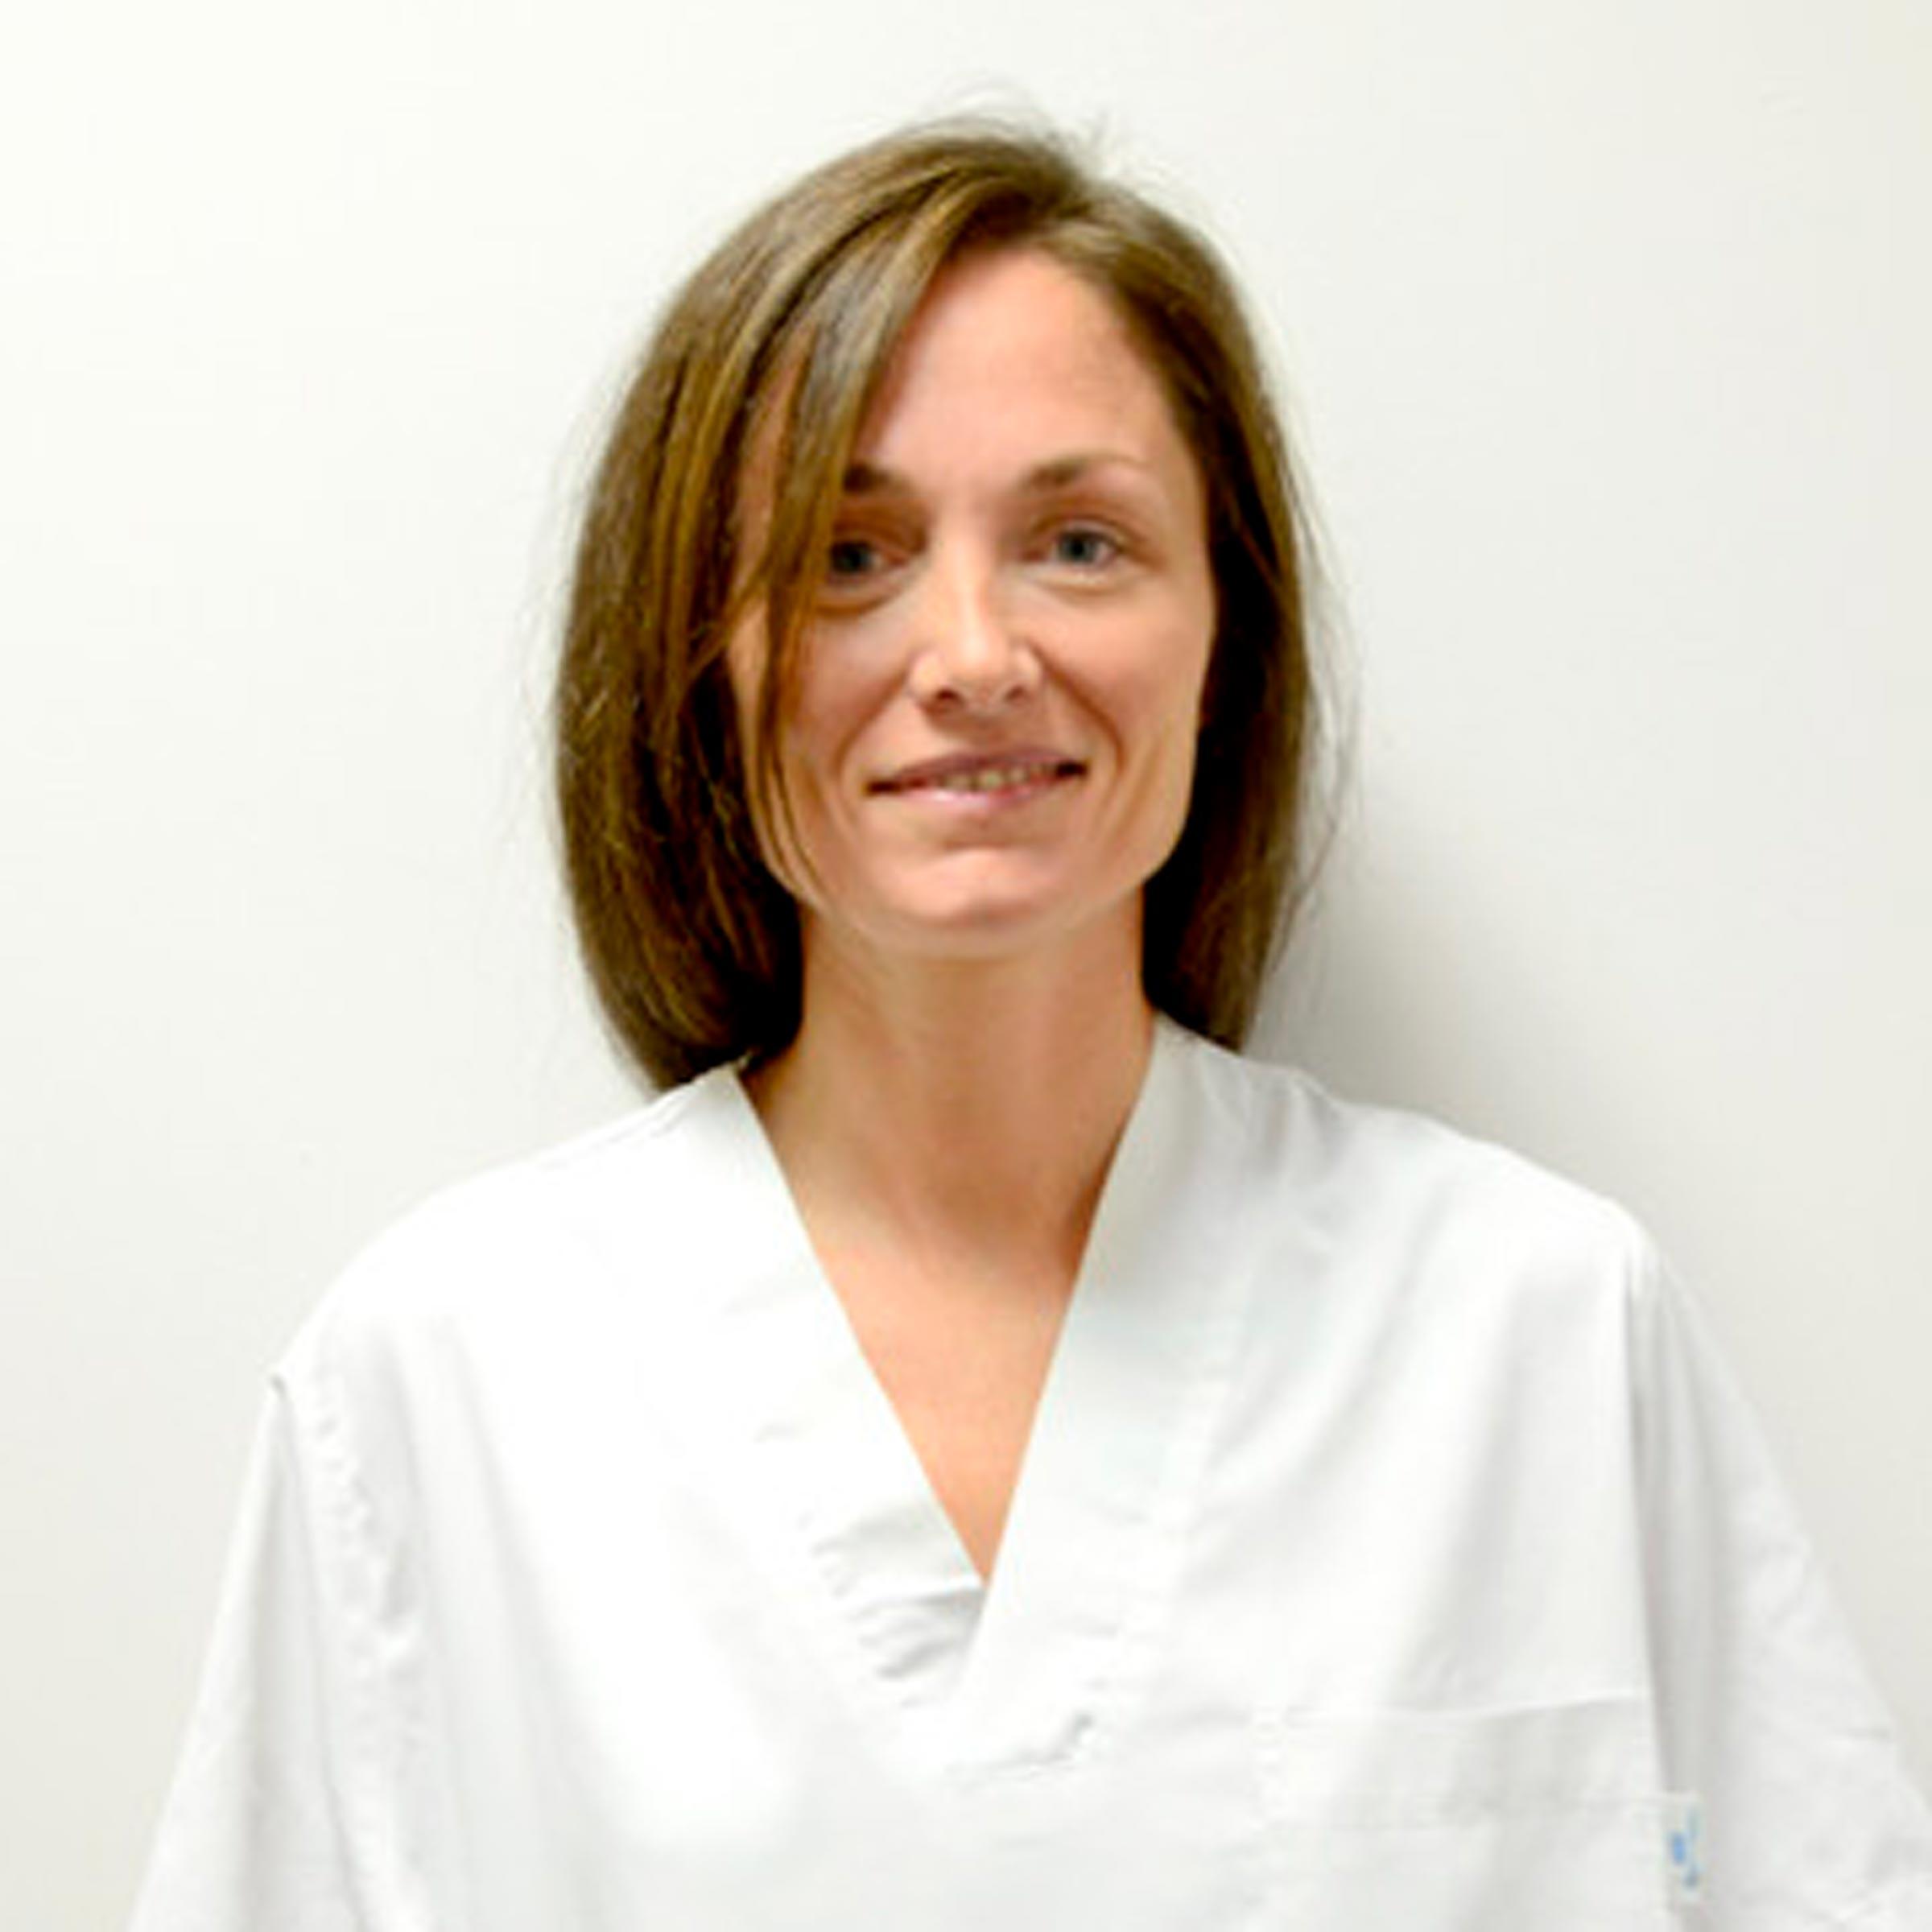 Dra. Daniela Cummins